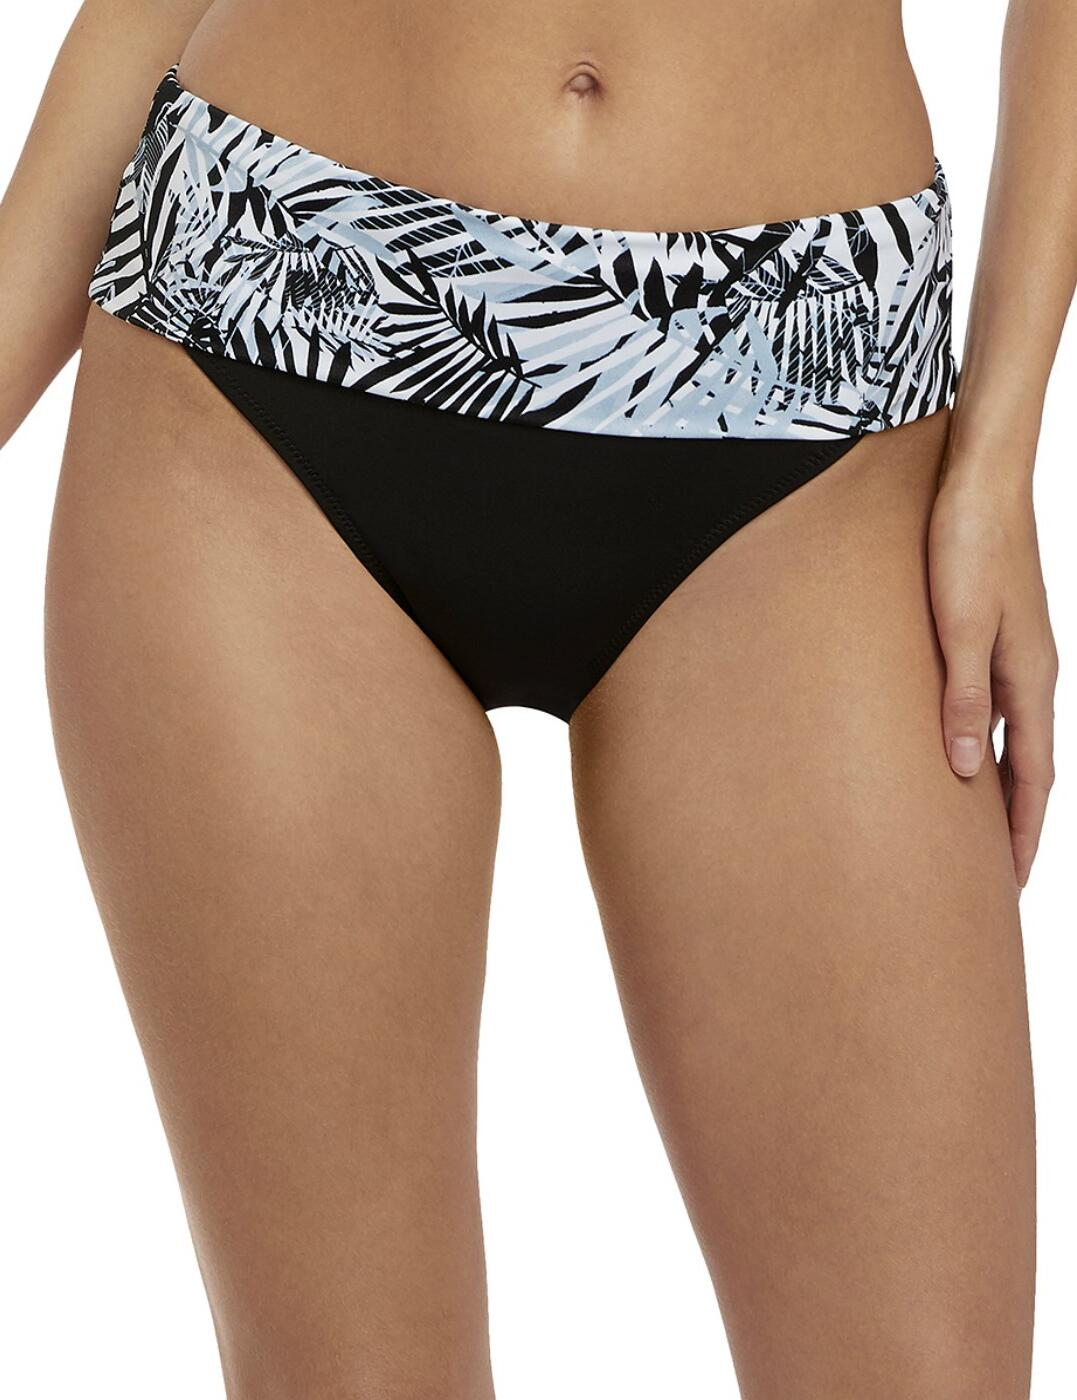 6490 Fantasie Kiso Valley Classic Fold Bikini Brief - 6490 Monochrome